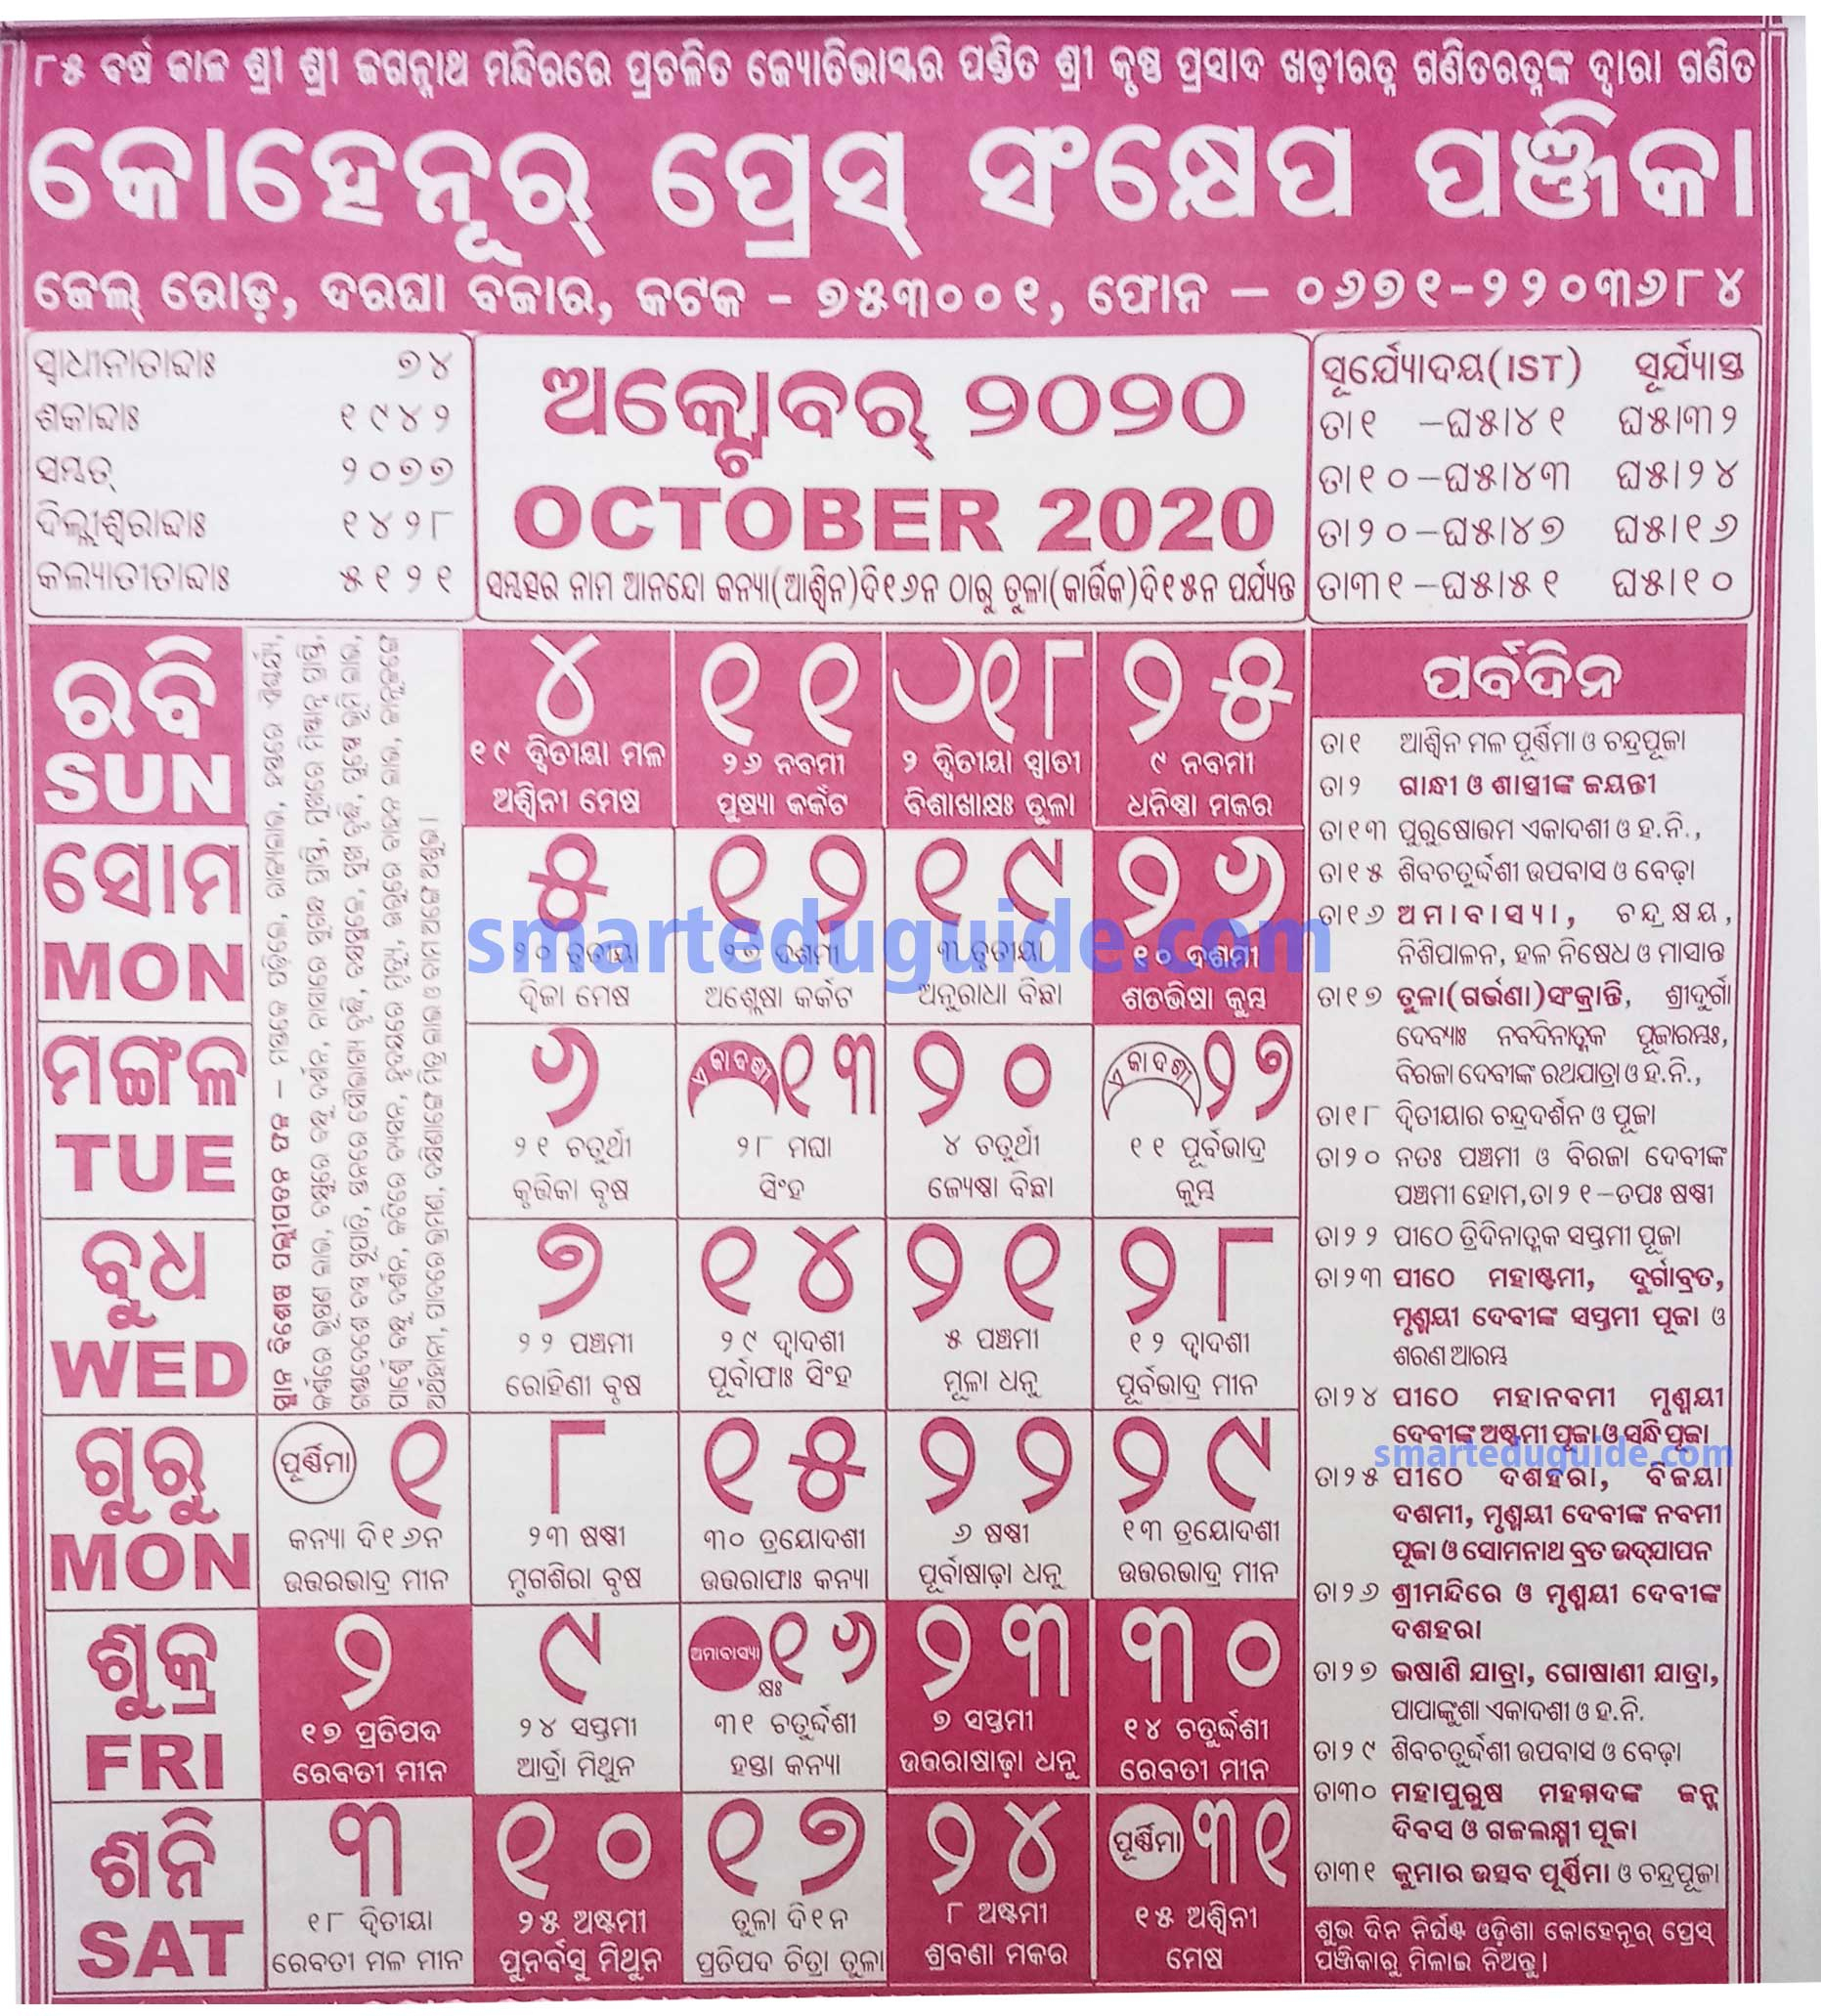 Odia Kohinoor Calendar 2020 October | Odishain inside 2020 Oriya Calendar